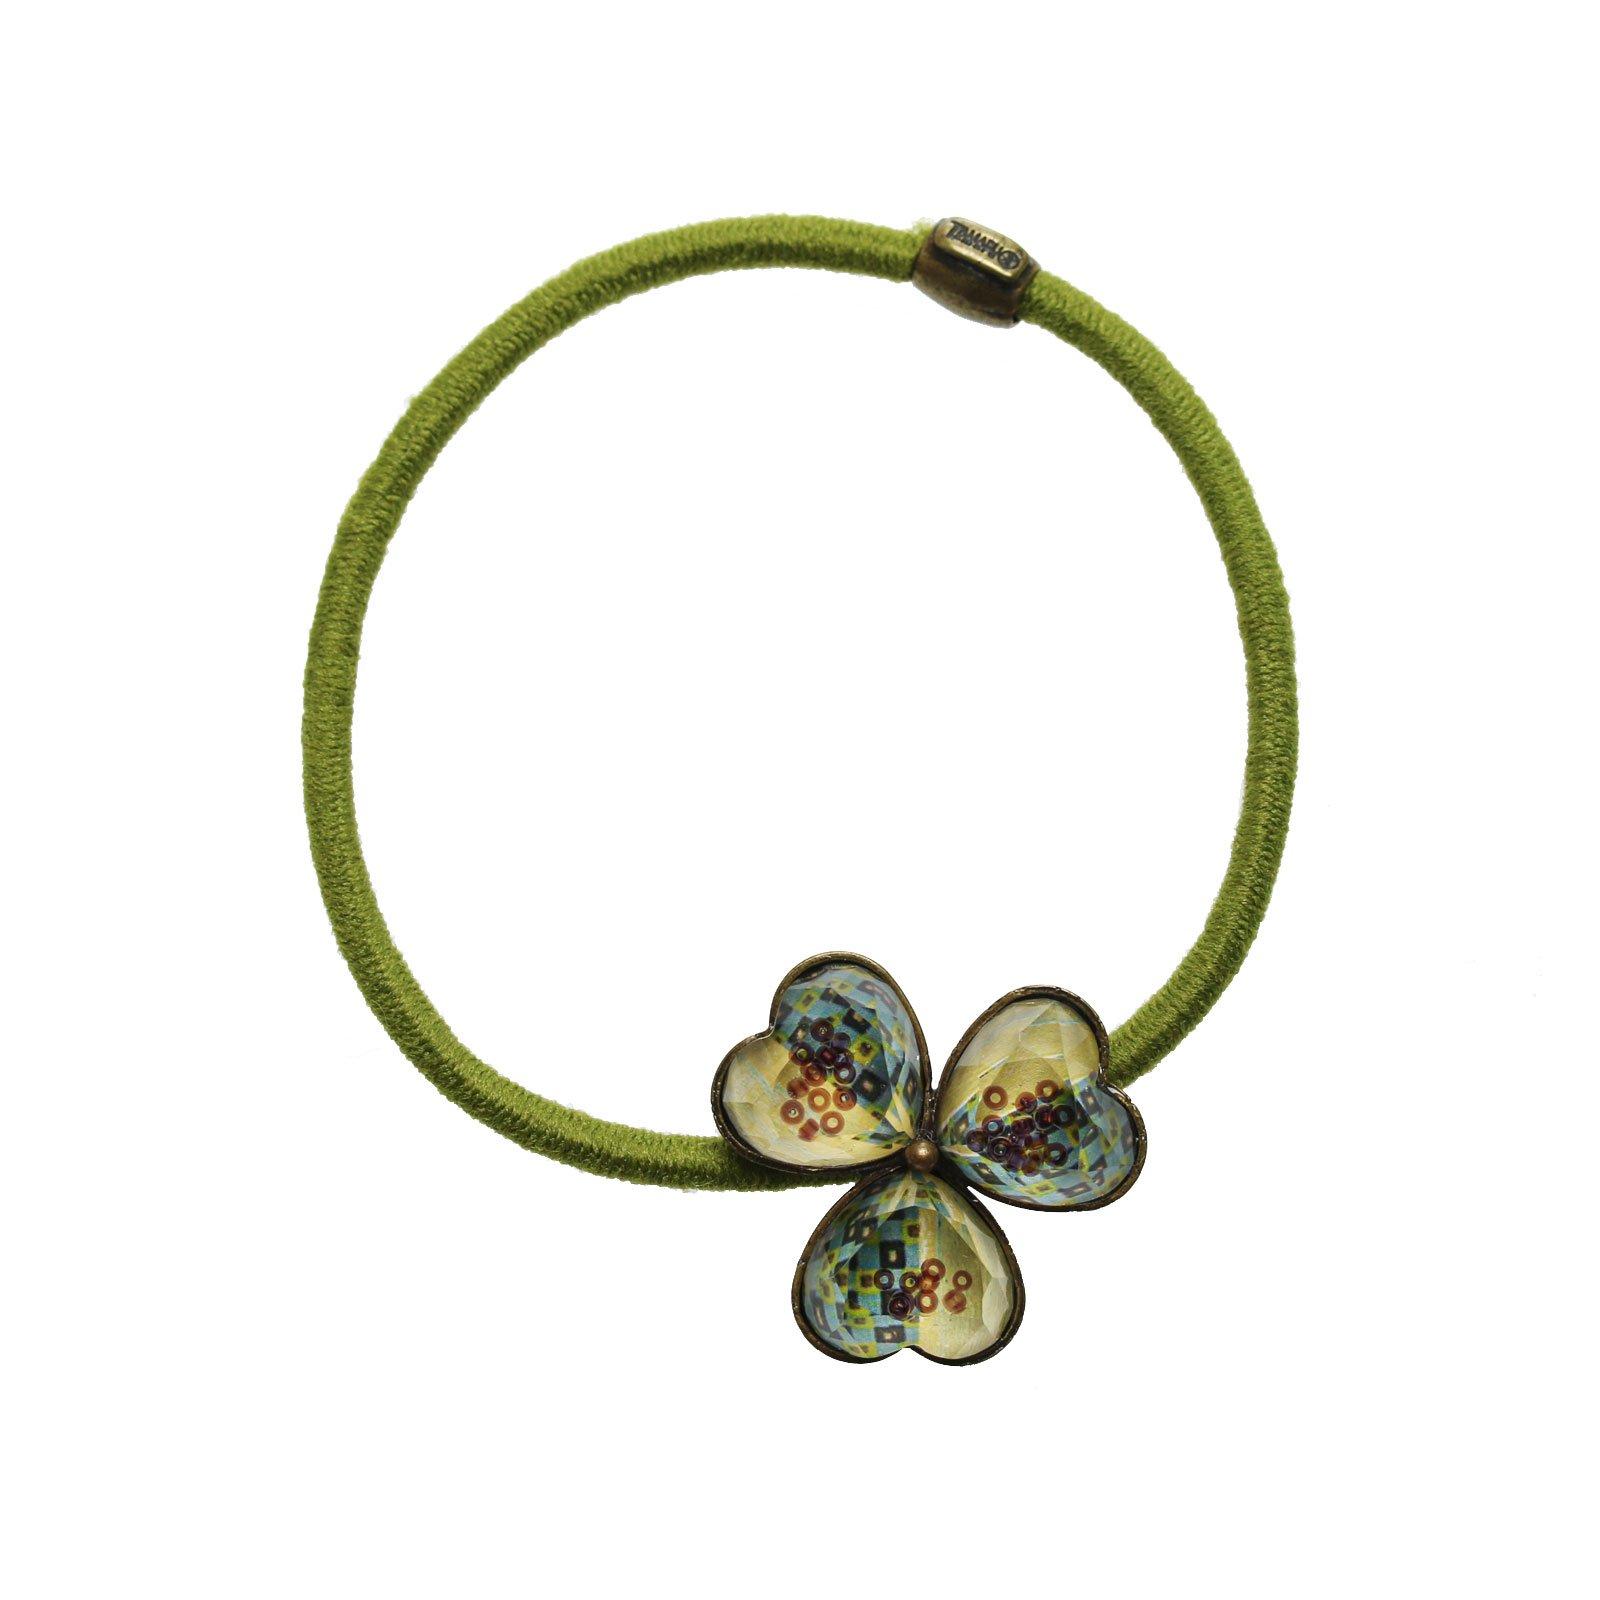 Tamarusan Ponytail Holder Hair Green Elegance Carpet Pattern Hair Ornament Flower